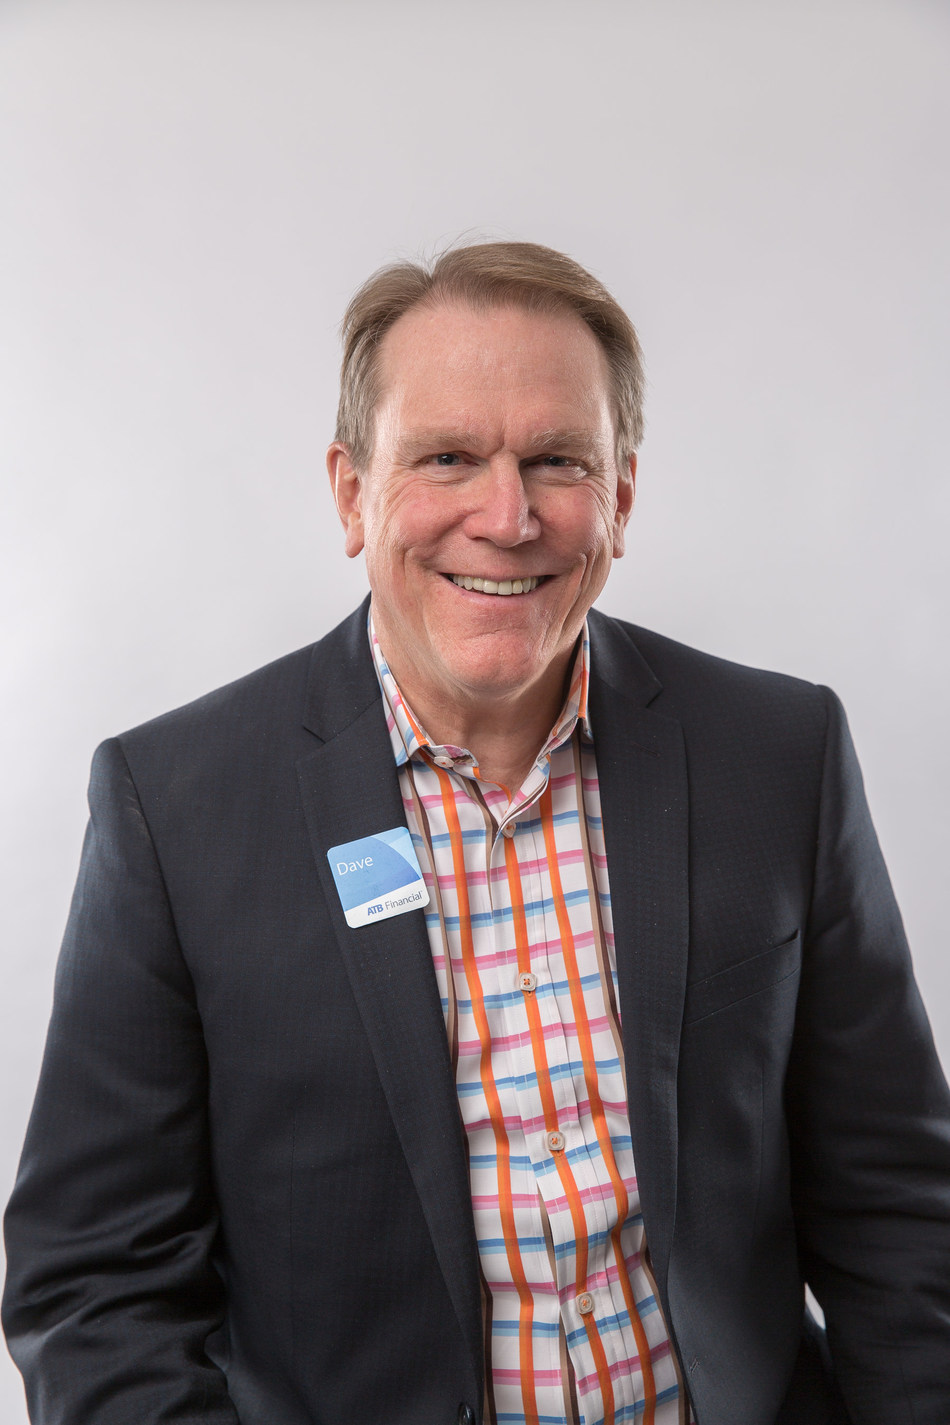 Dave Mowat, President & CEO, ATB Financial (CNW Group/ATB Financial)